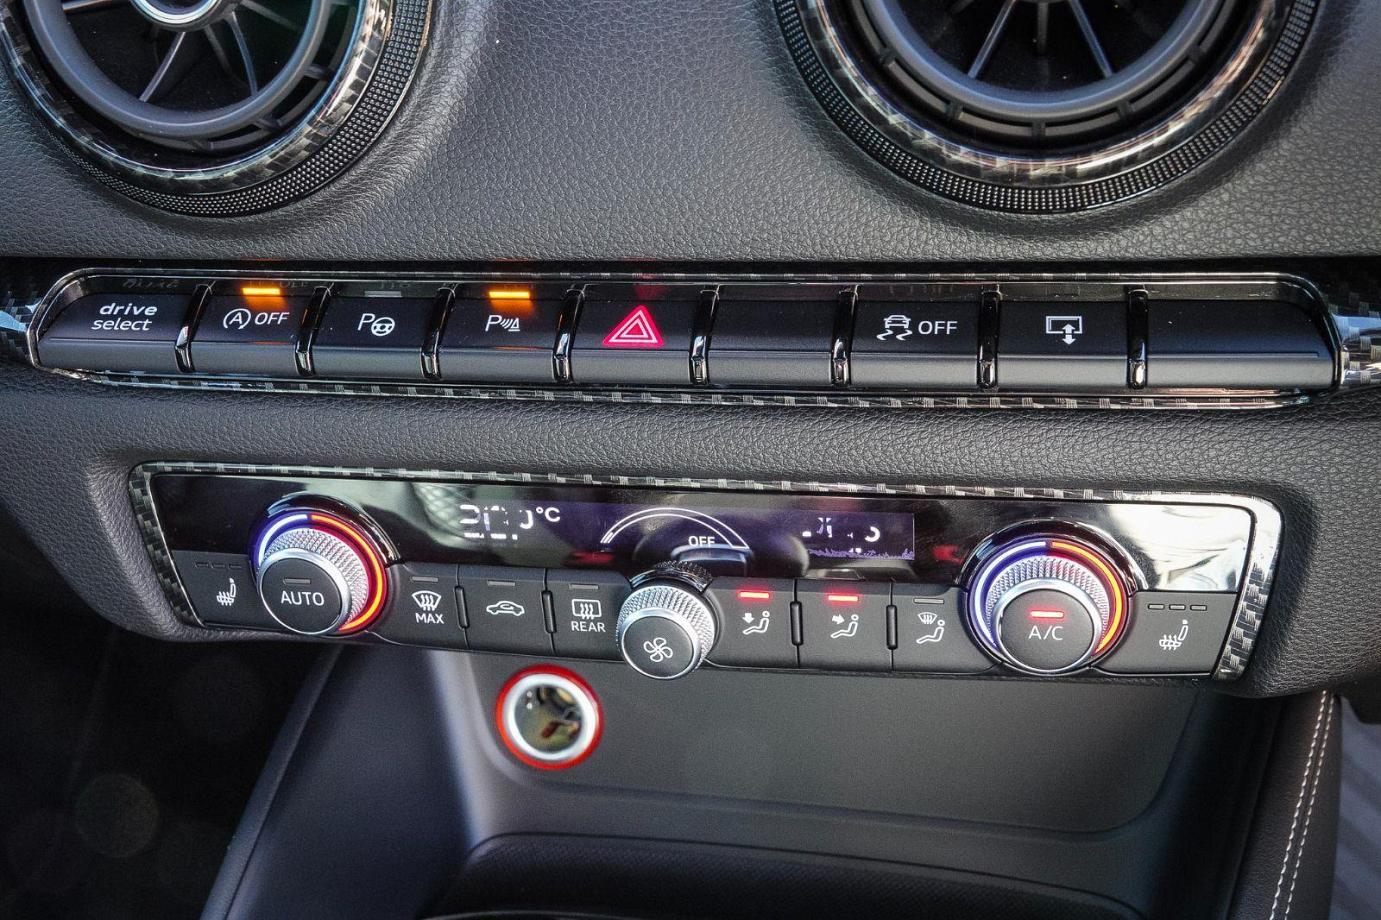 2015 Audi S3 8V MY15. Sedan 4dr S tronic 6sp quattro 2.0T